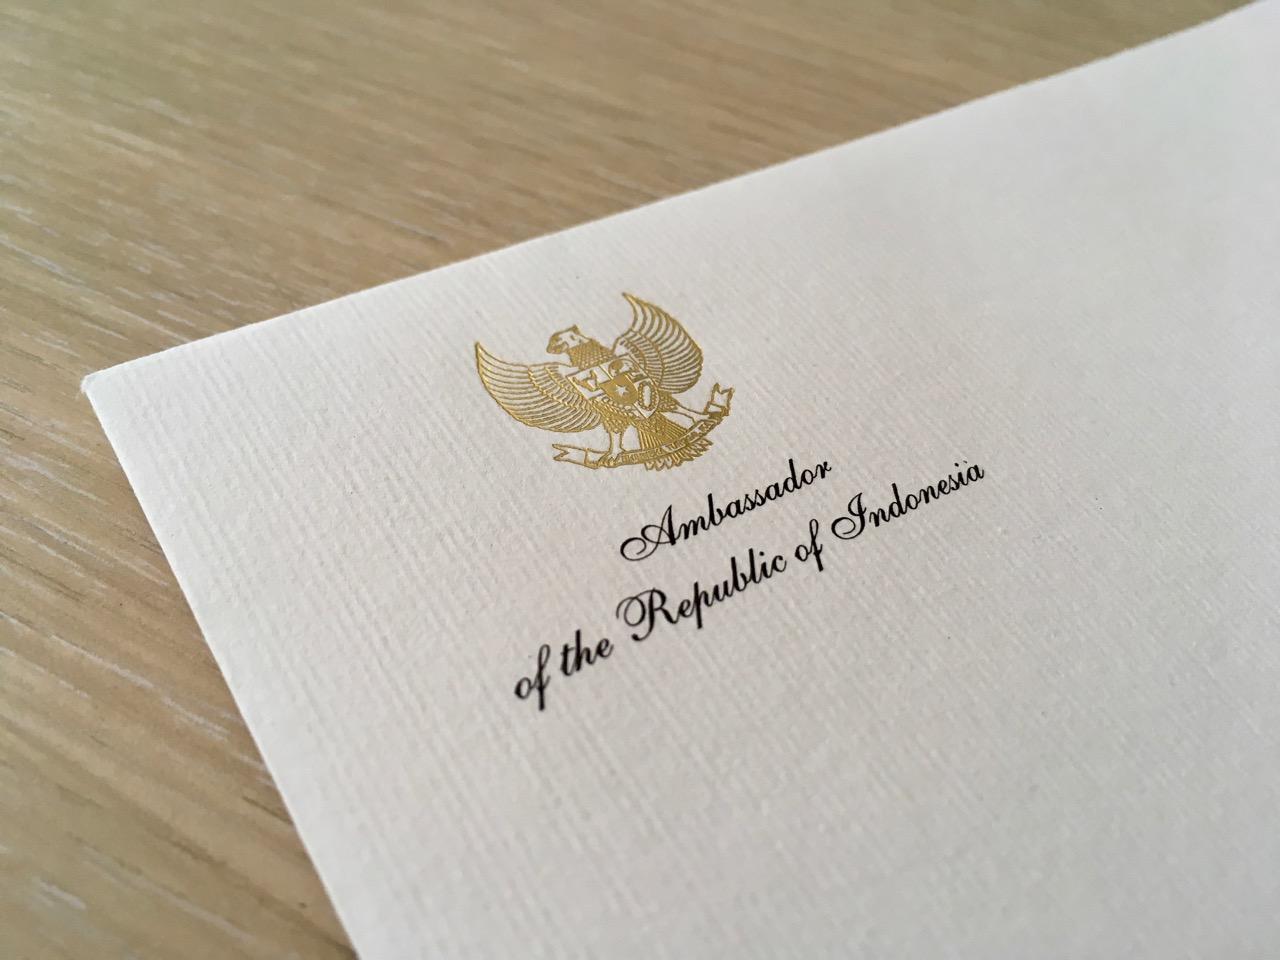 Koverta sa zlatotiskom na rebrastom papiru - Beoprint štamparija Beograd